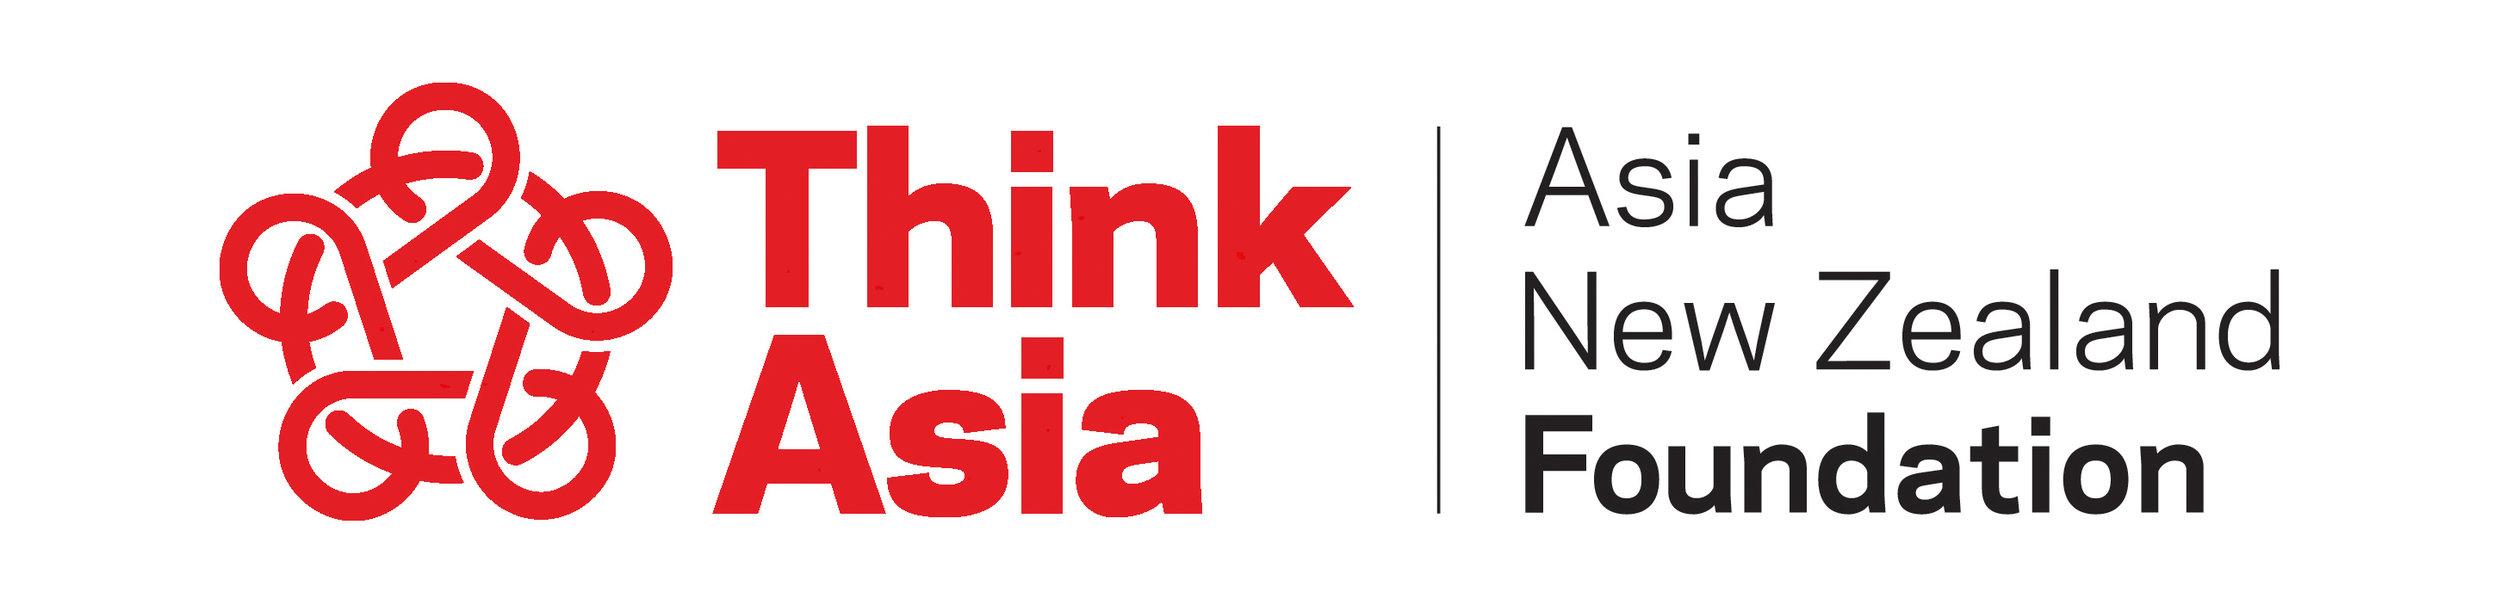 ThinkAsia Red Knot Black Text White background Jpeg.jpg